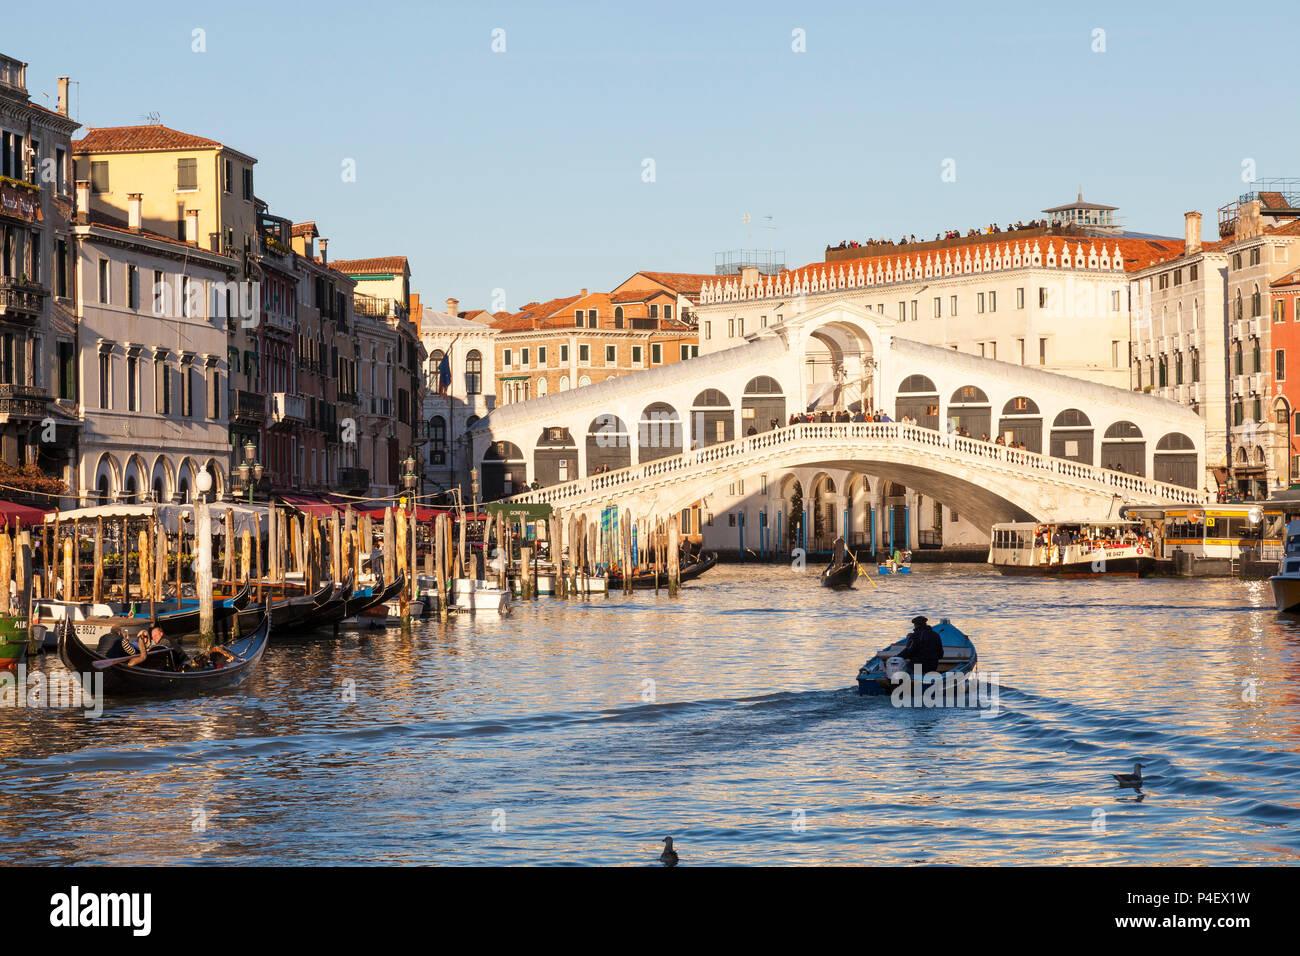 Rialto Bridge, Grand Canal, at sunset with gondolas and small boat with wake, Venice, Veneto, Italy - Stock Image